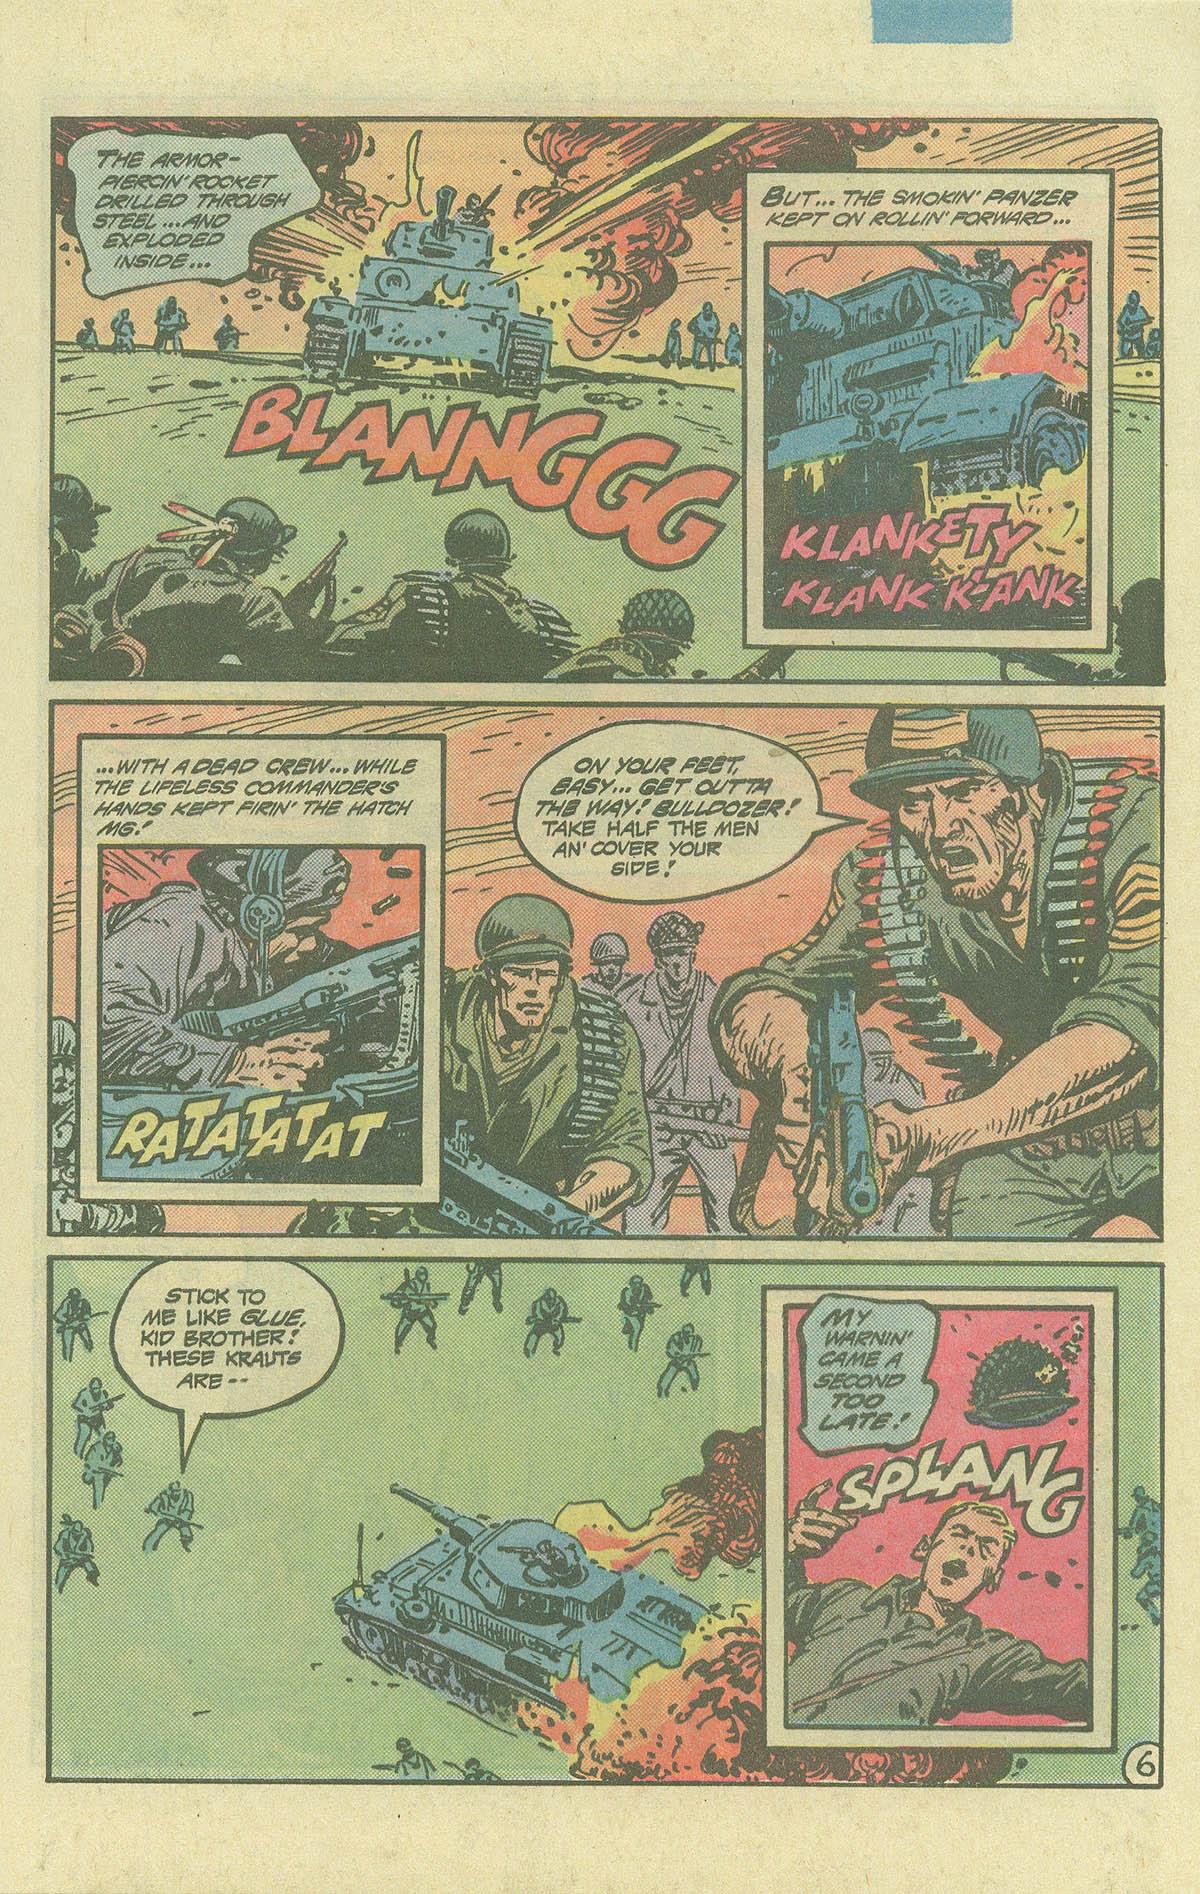 Read online Sgt. Rock comic -  Issue #393 - 6